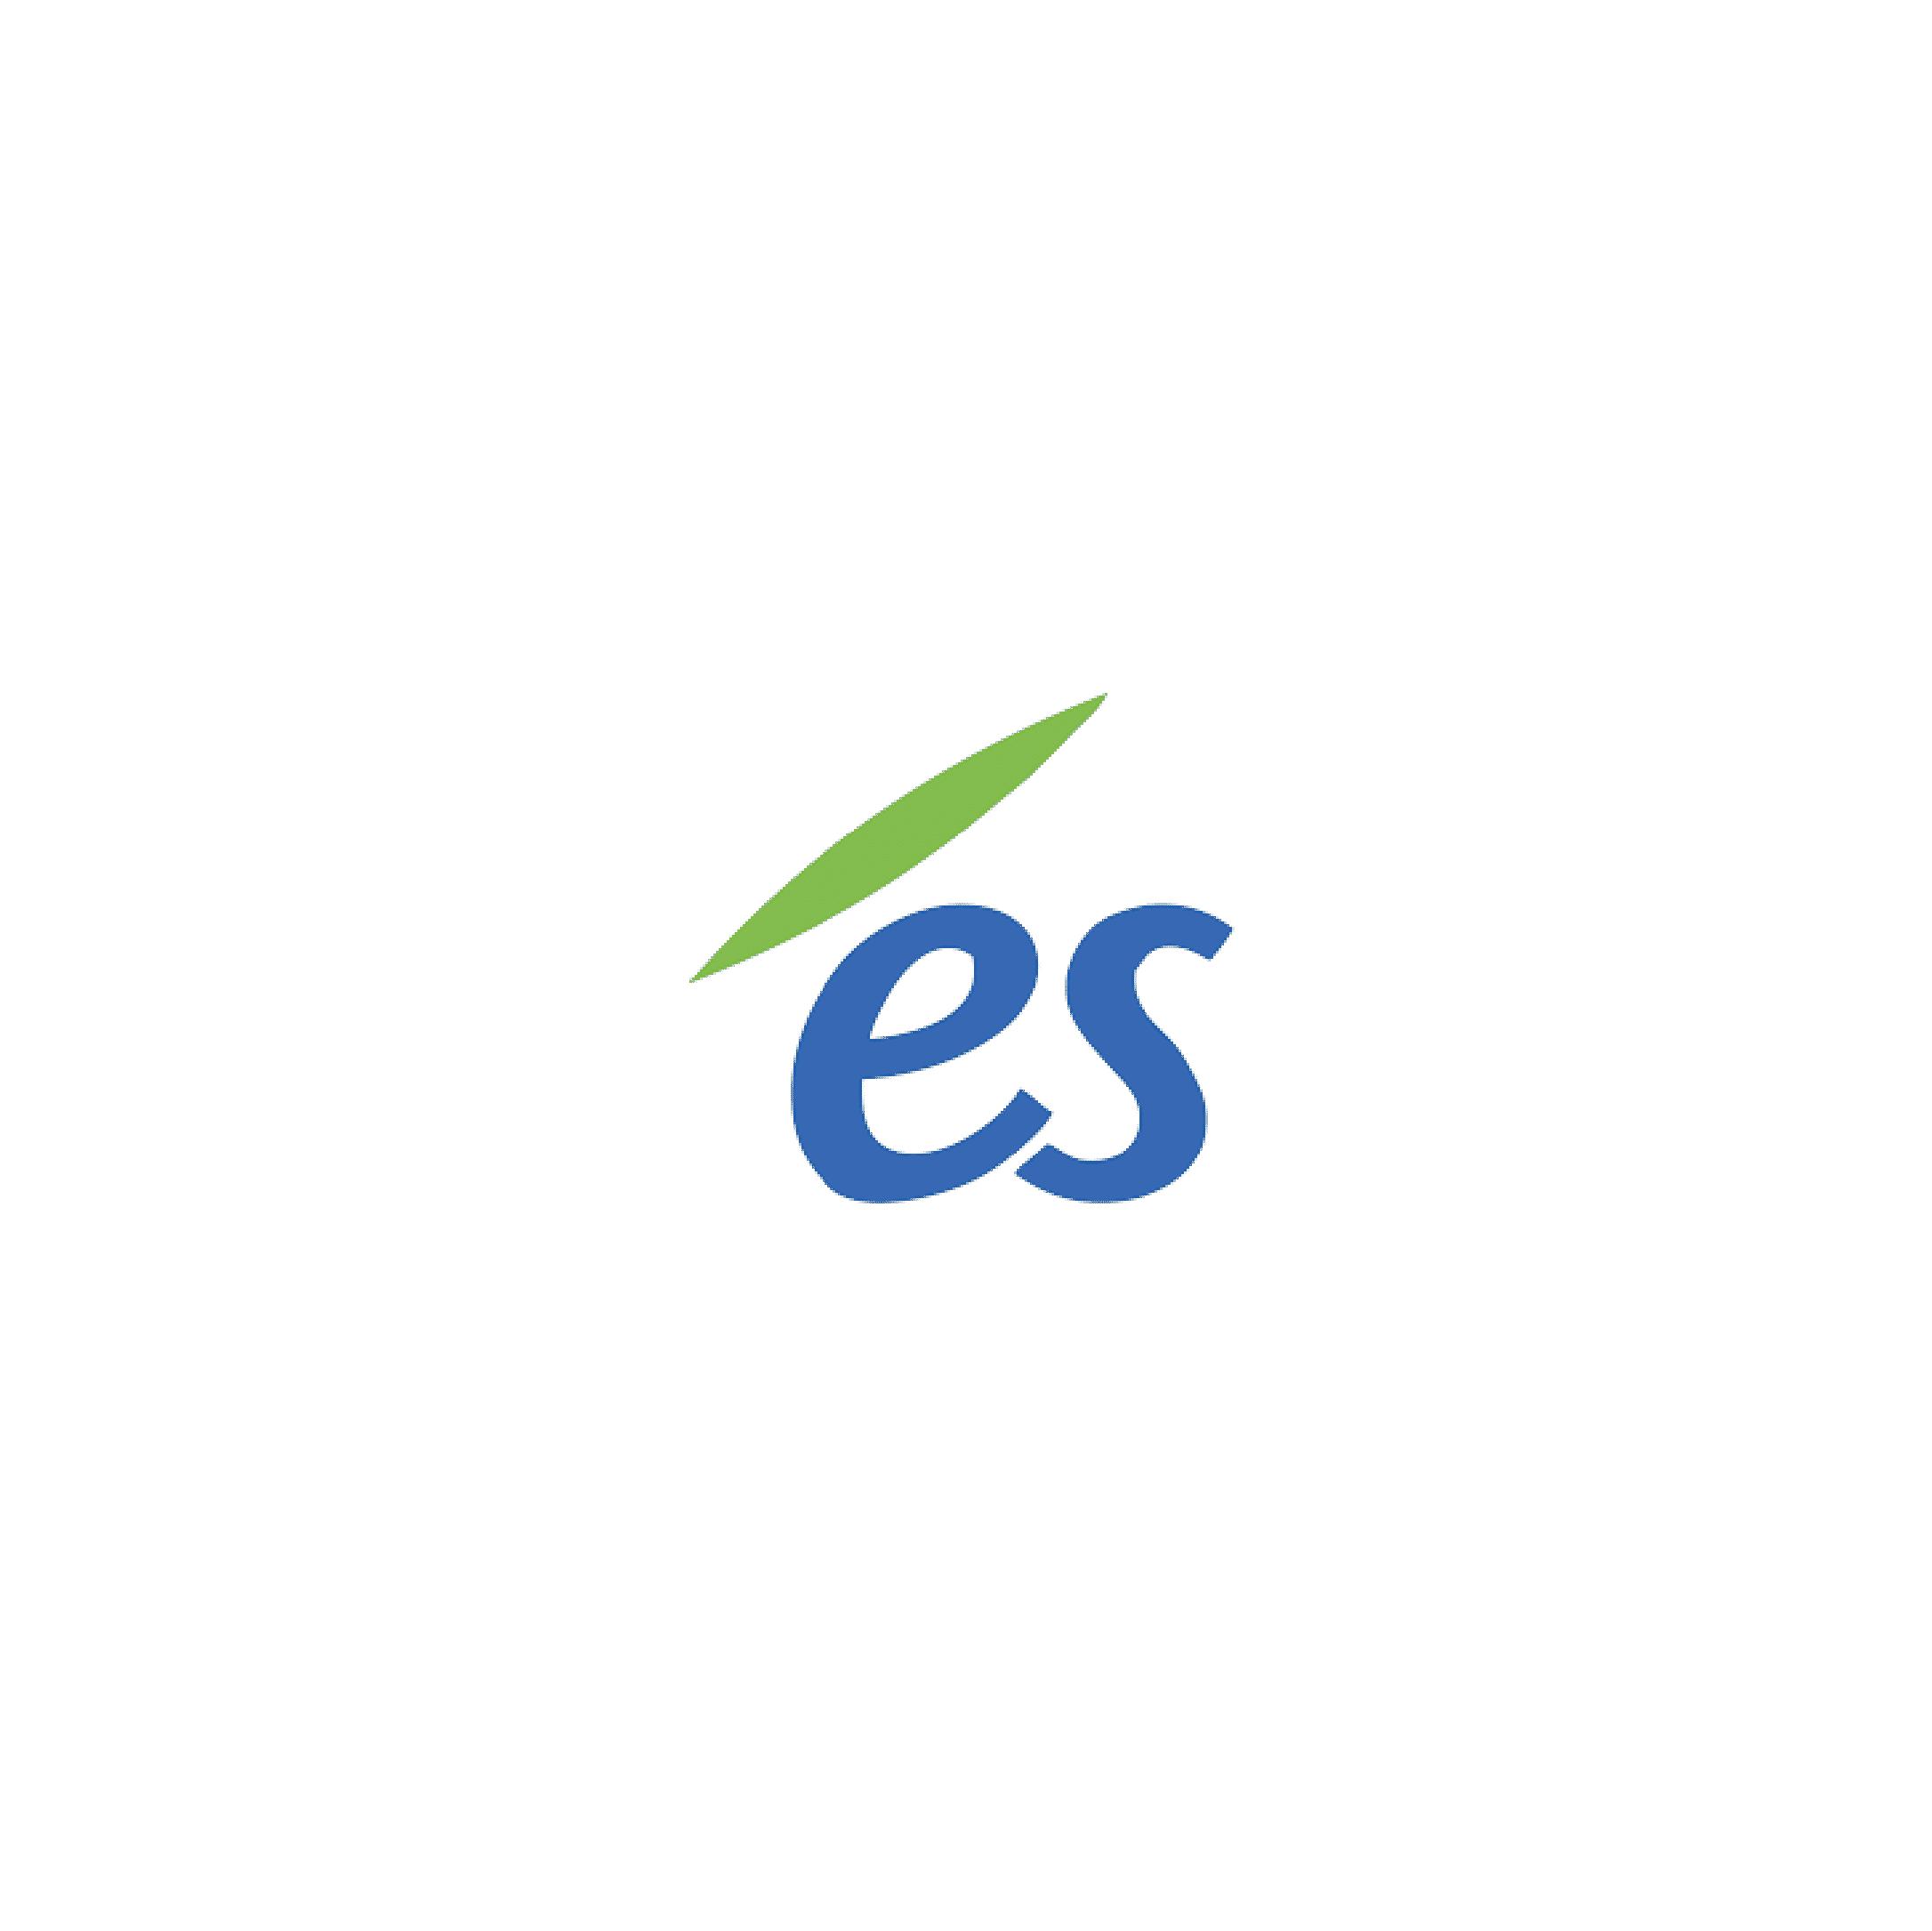 DialOnce-Telecom-logo-ES-Energie